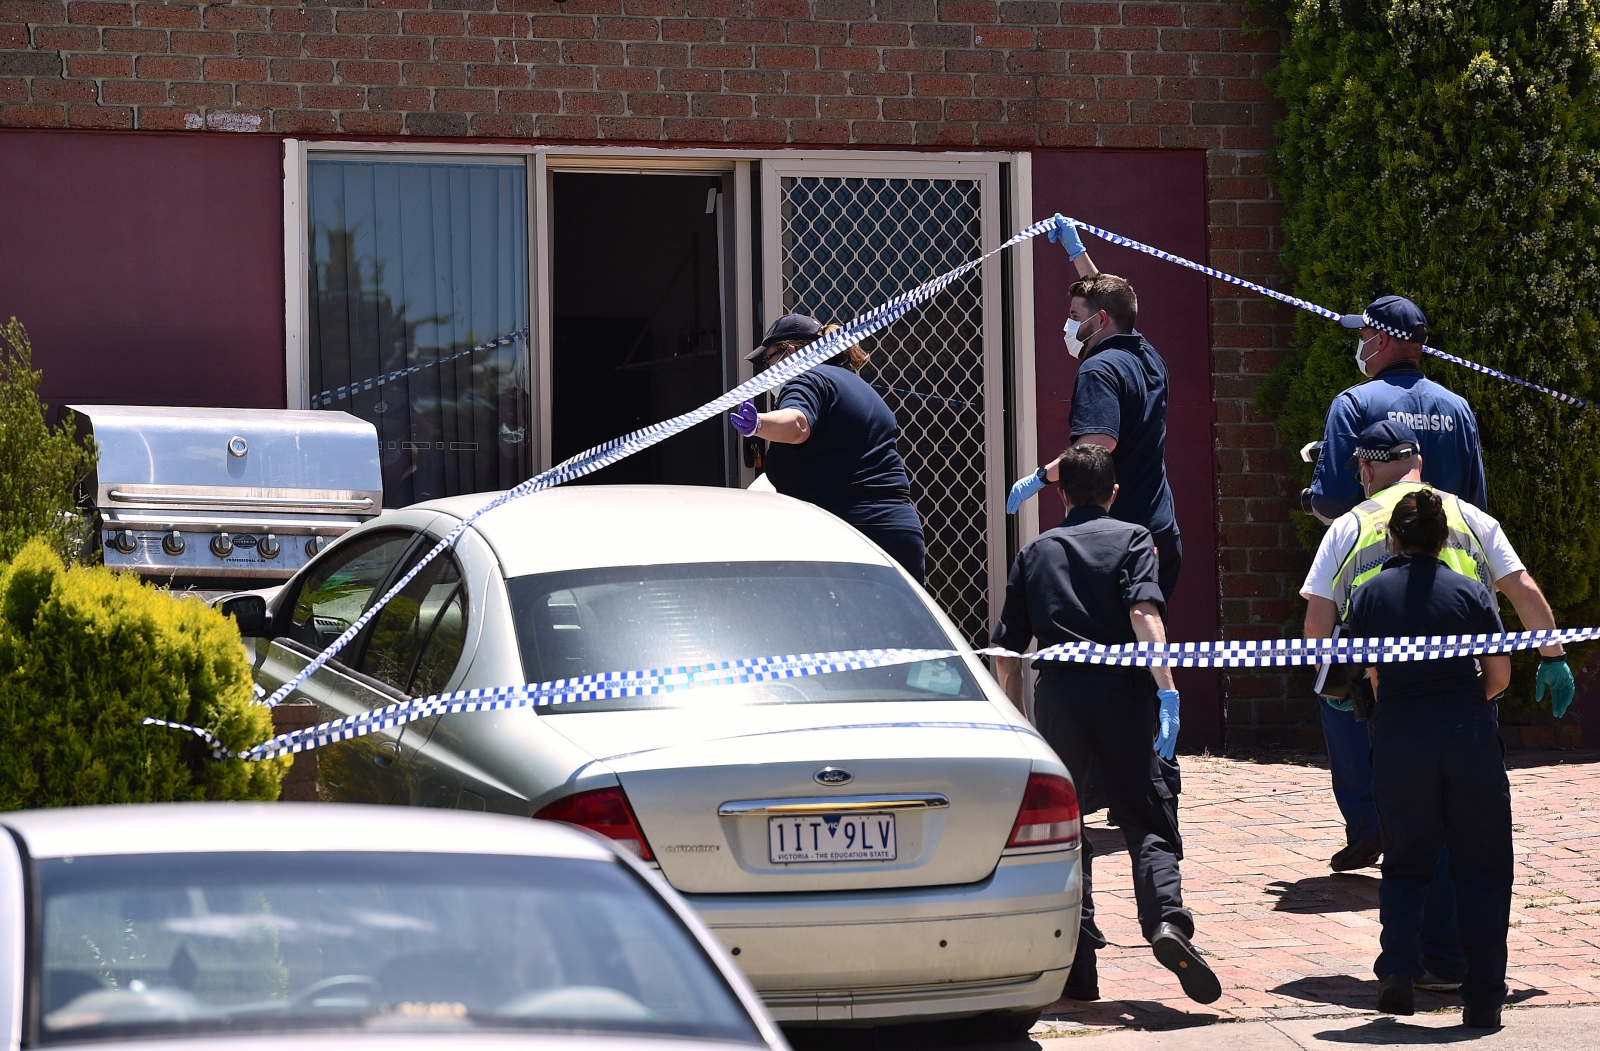 Australia foiled Christmas day attack